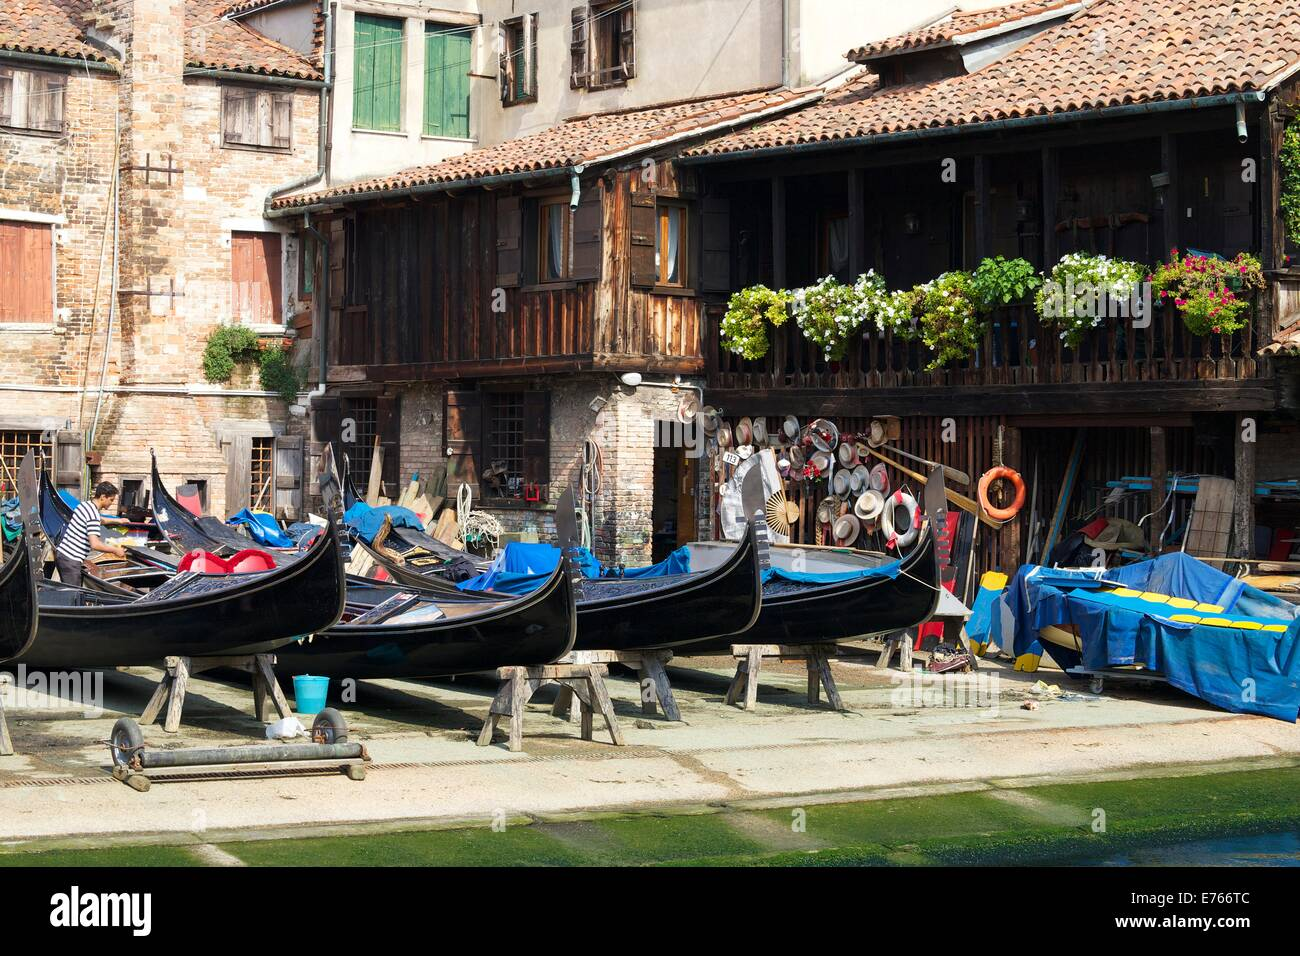 Squero di San Trovaso, Gondola boatyard, Venice, Veneto, Italy, Europe - Stock Image